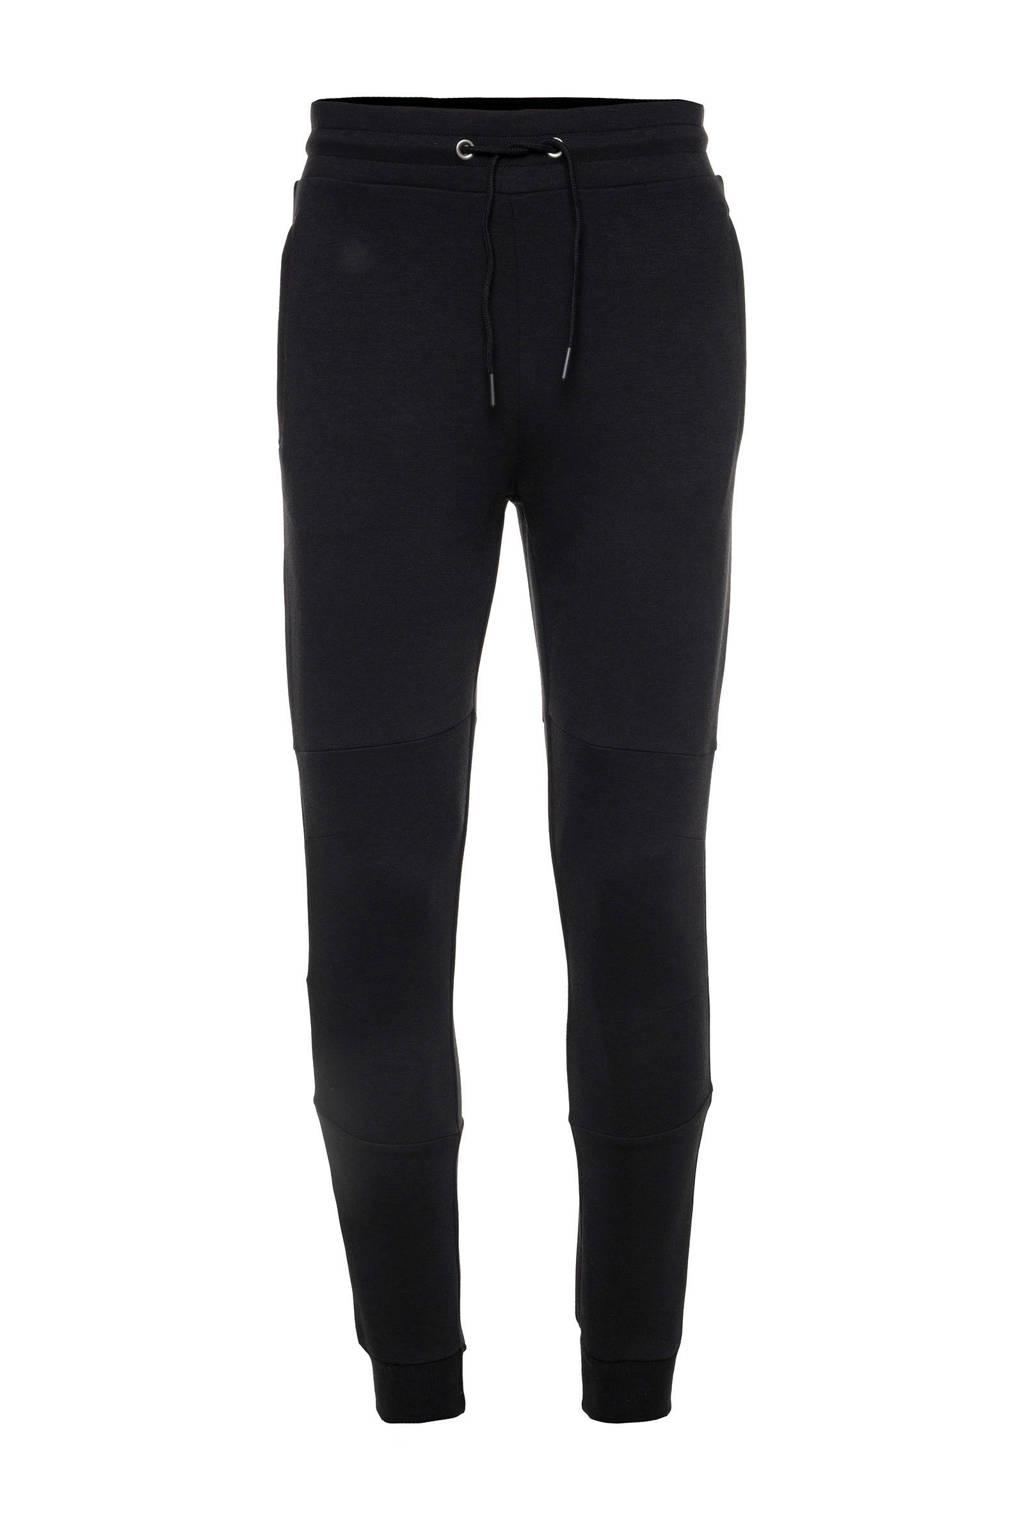 Scapino Osaga joggingbroek zwart, Zwart